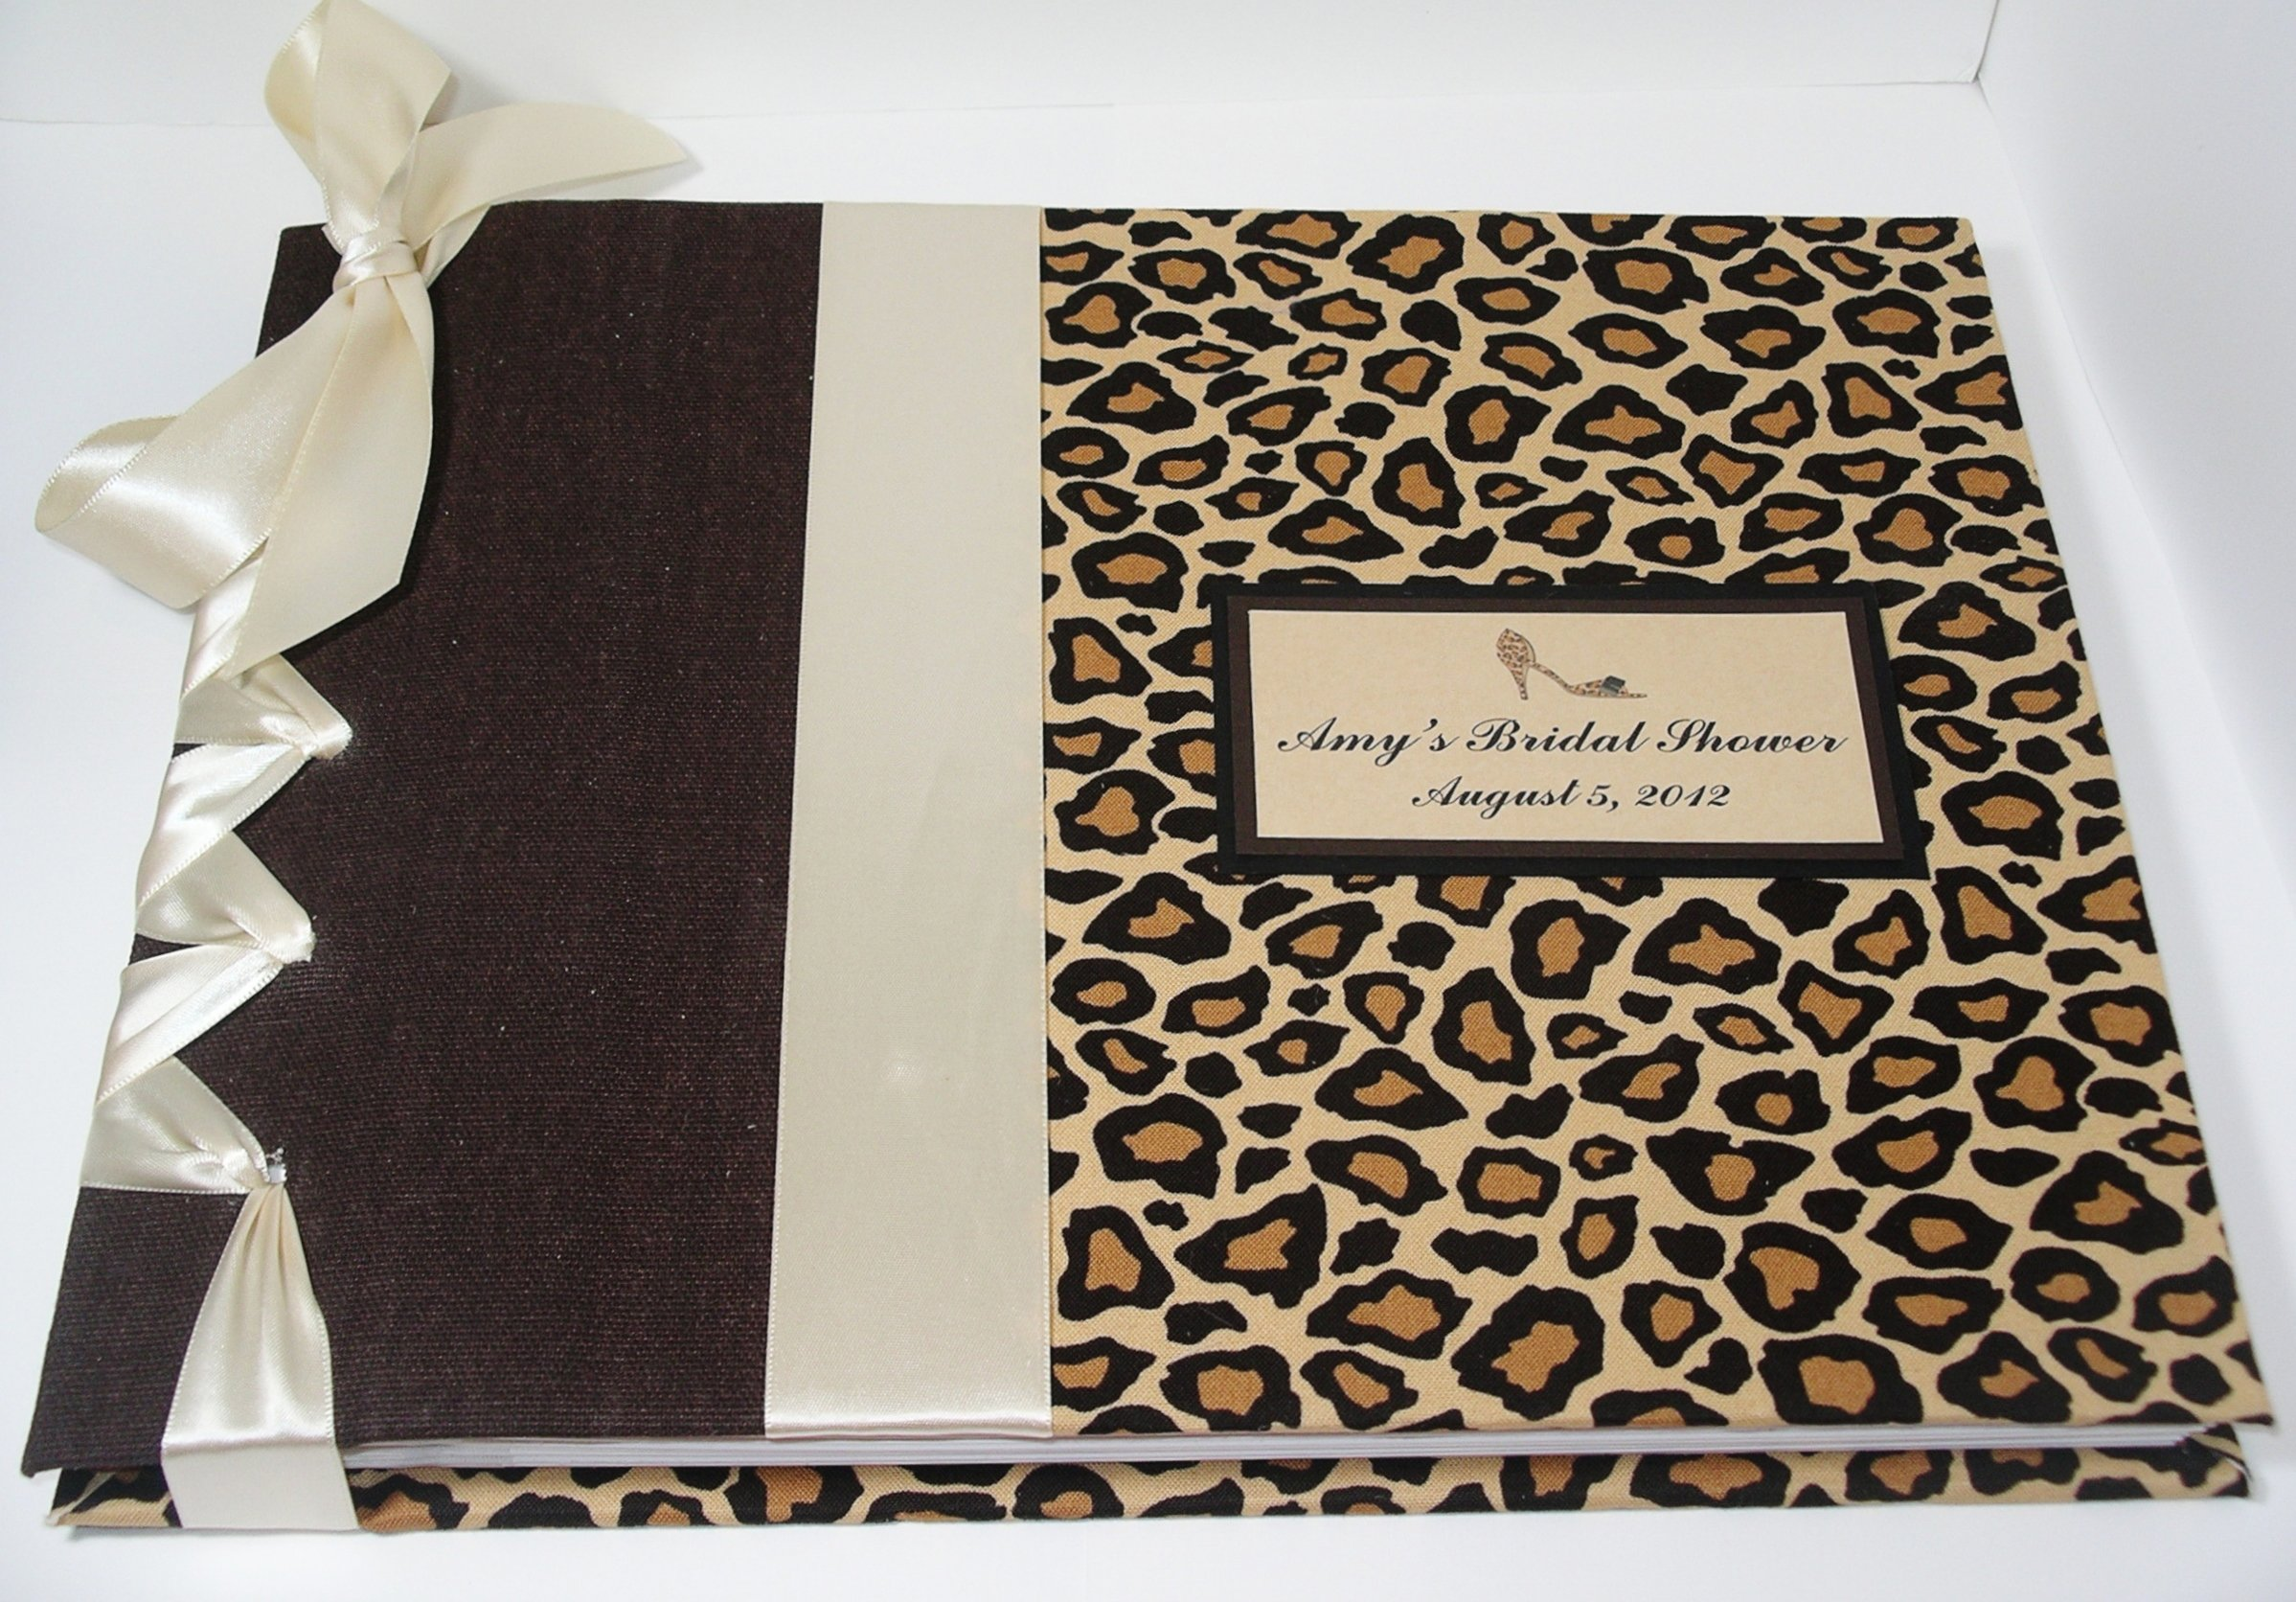 Bridal Shower Guest Book - Cheetah Guestbook - Leopard Guest Book - Animal Print Guest Book